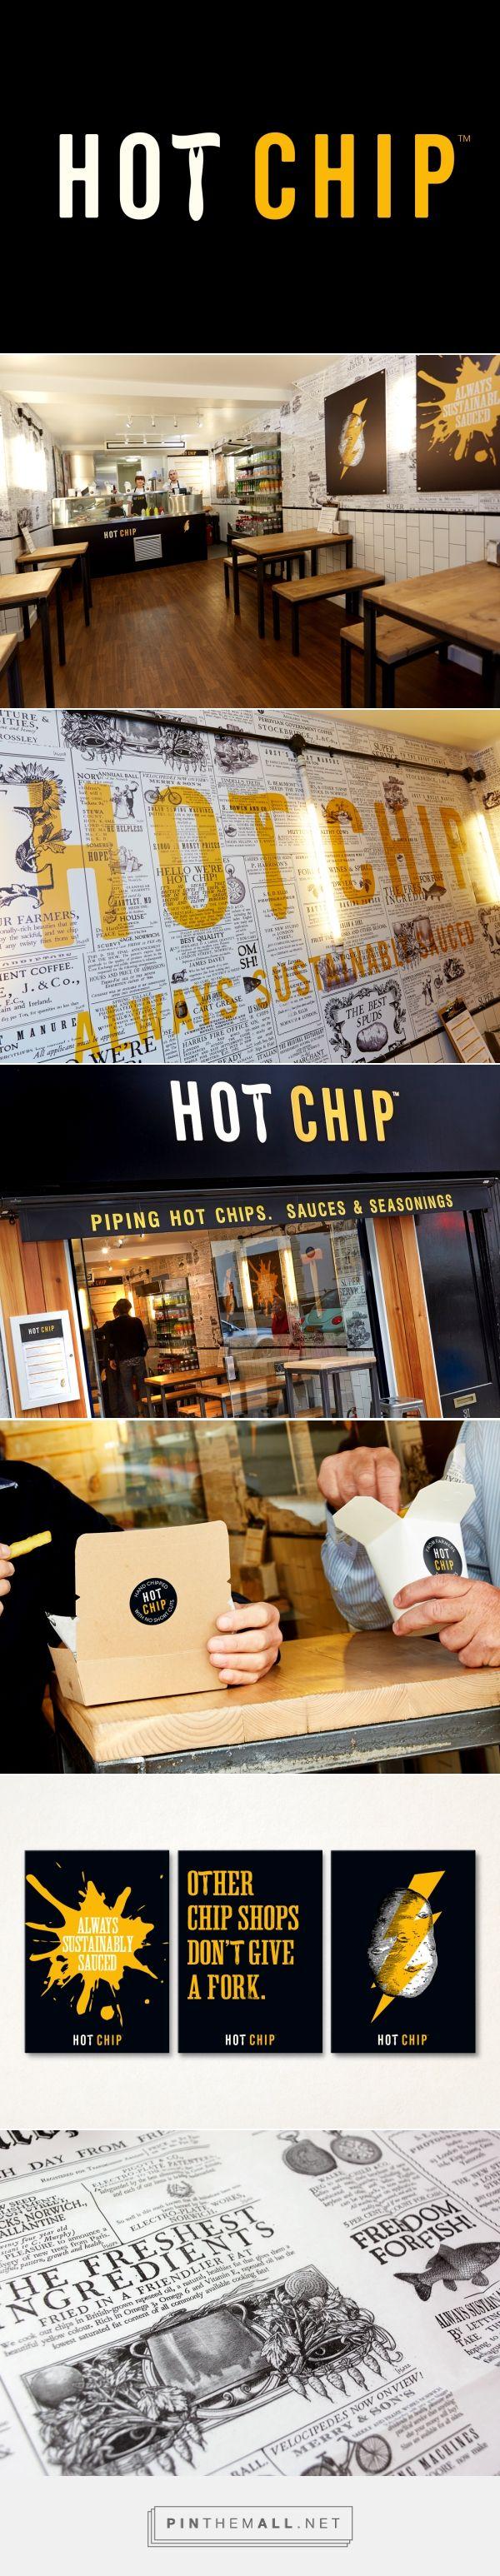 Hot Chip · B&B studio · creative and effective design - created via http://pinthemall.net